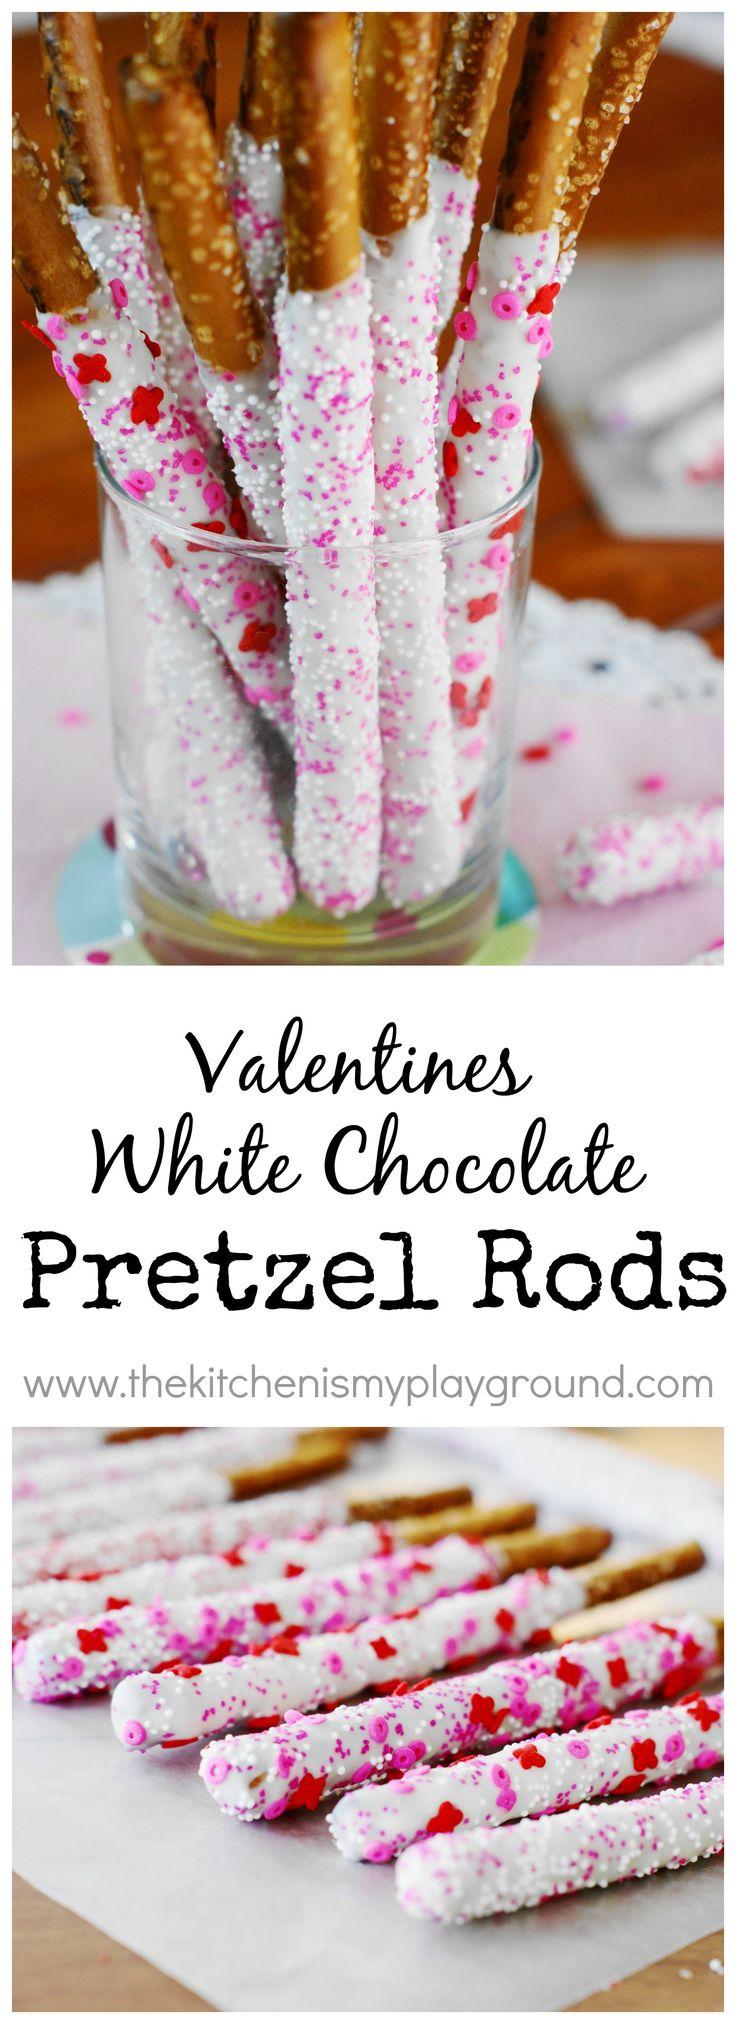 Valentines White Chocolate-Dipped Pretzel Rods ~ so pretty, and so easy.   www.thekitchenismyplayground.com